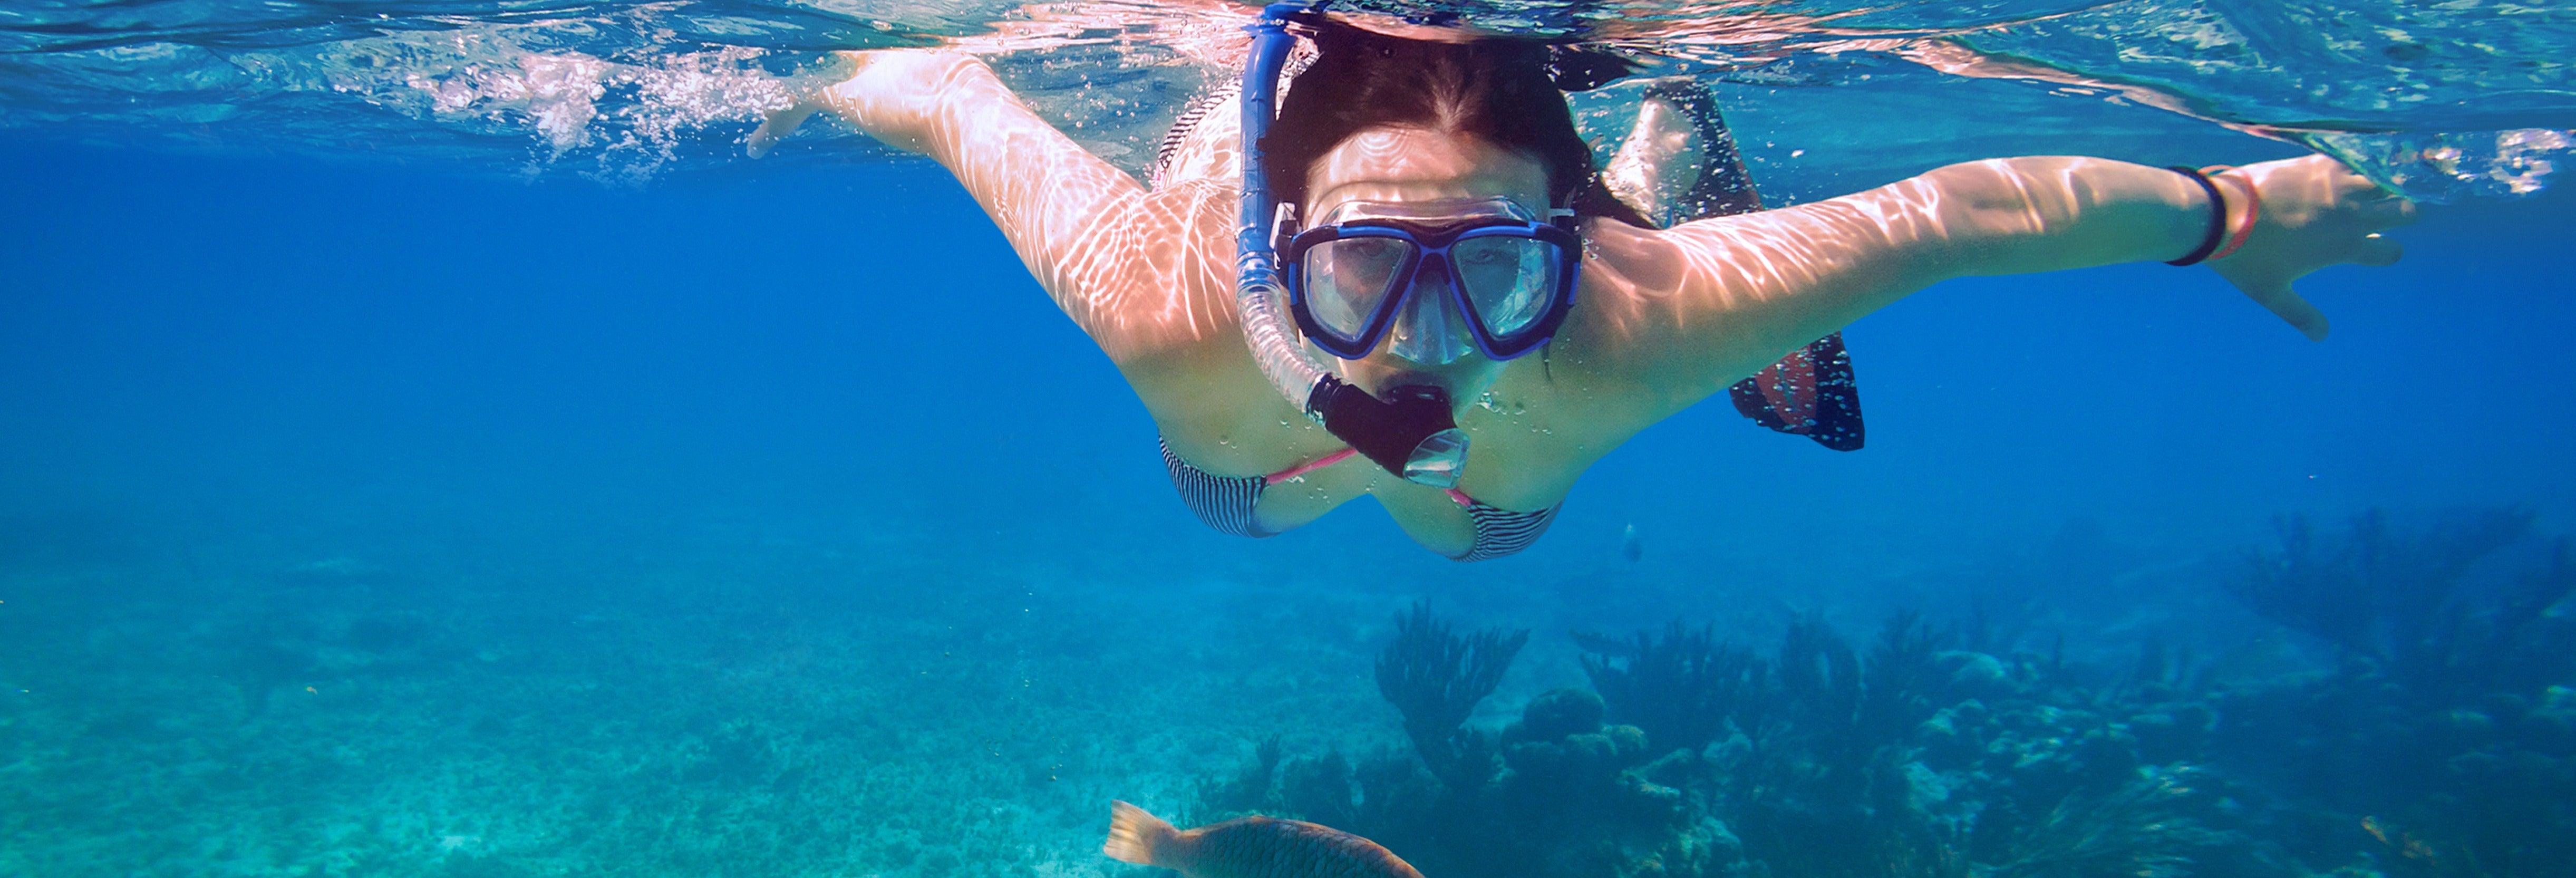 Caiaque e snorkel no Oceano Pacífico